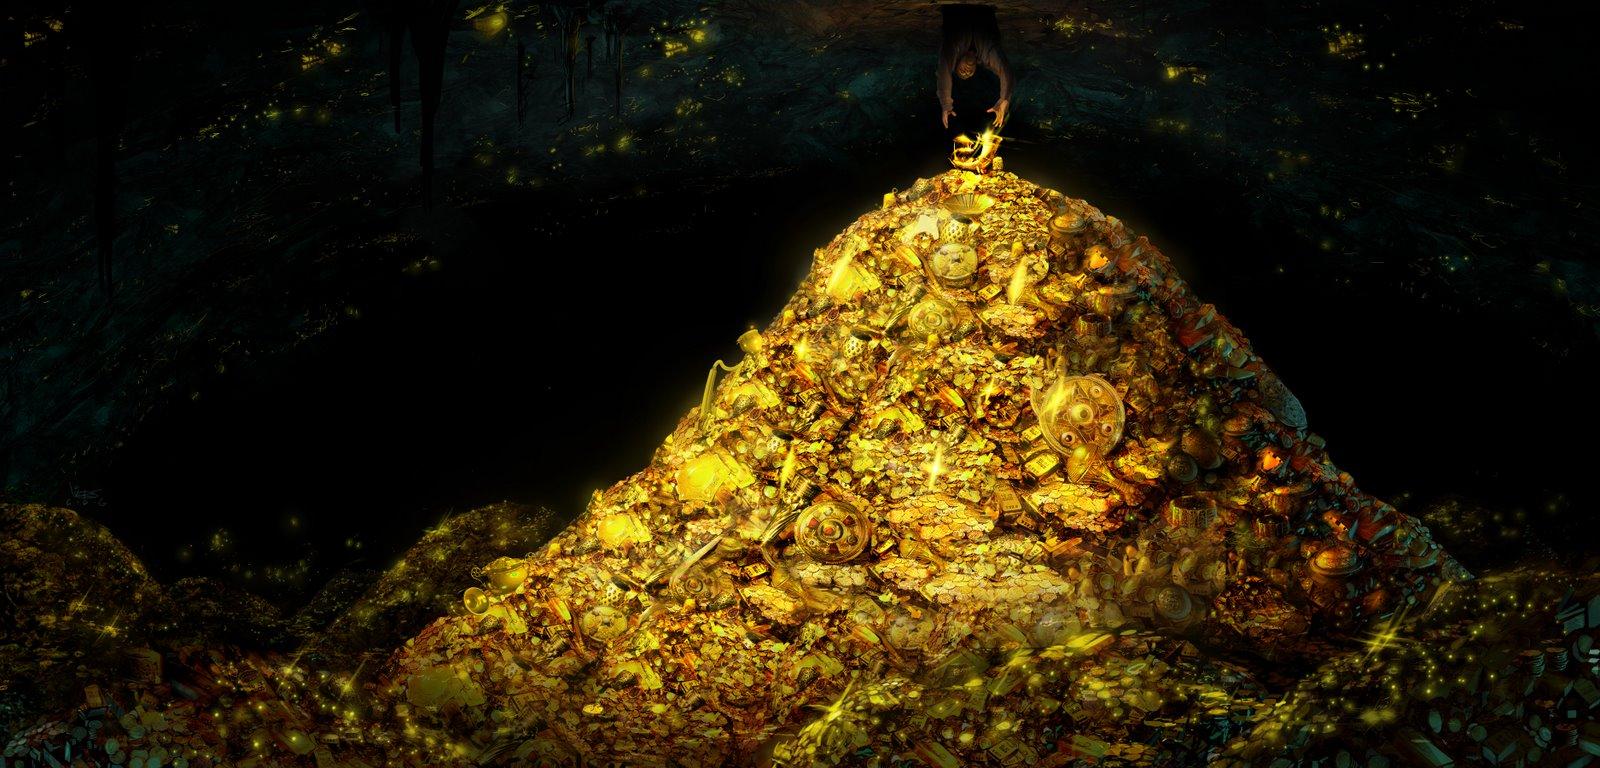 Treasure pile shot hugest wide